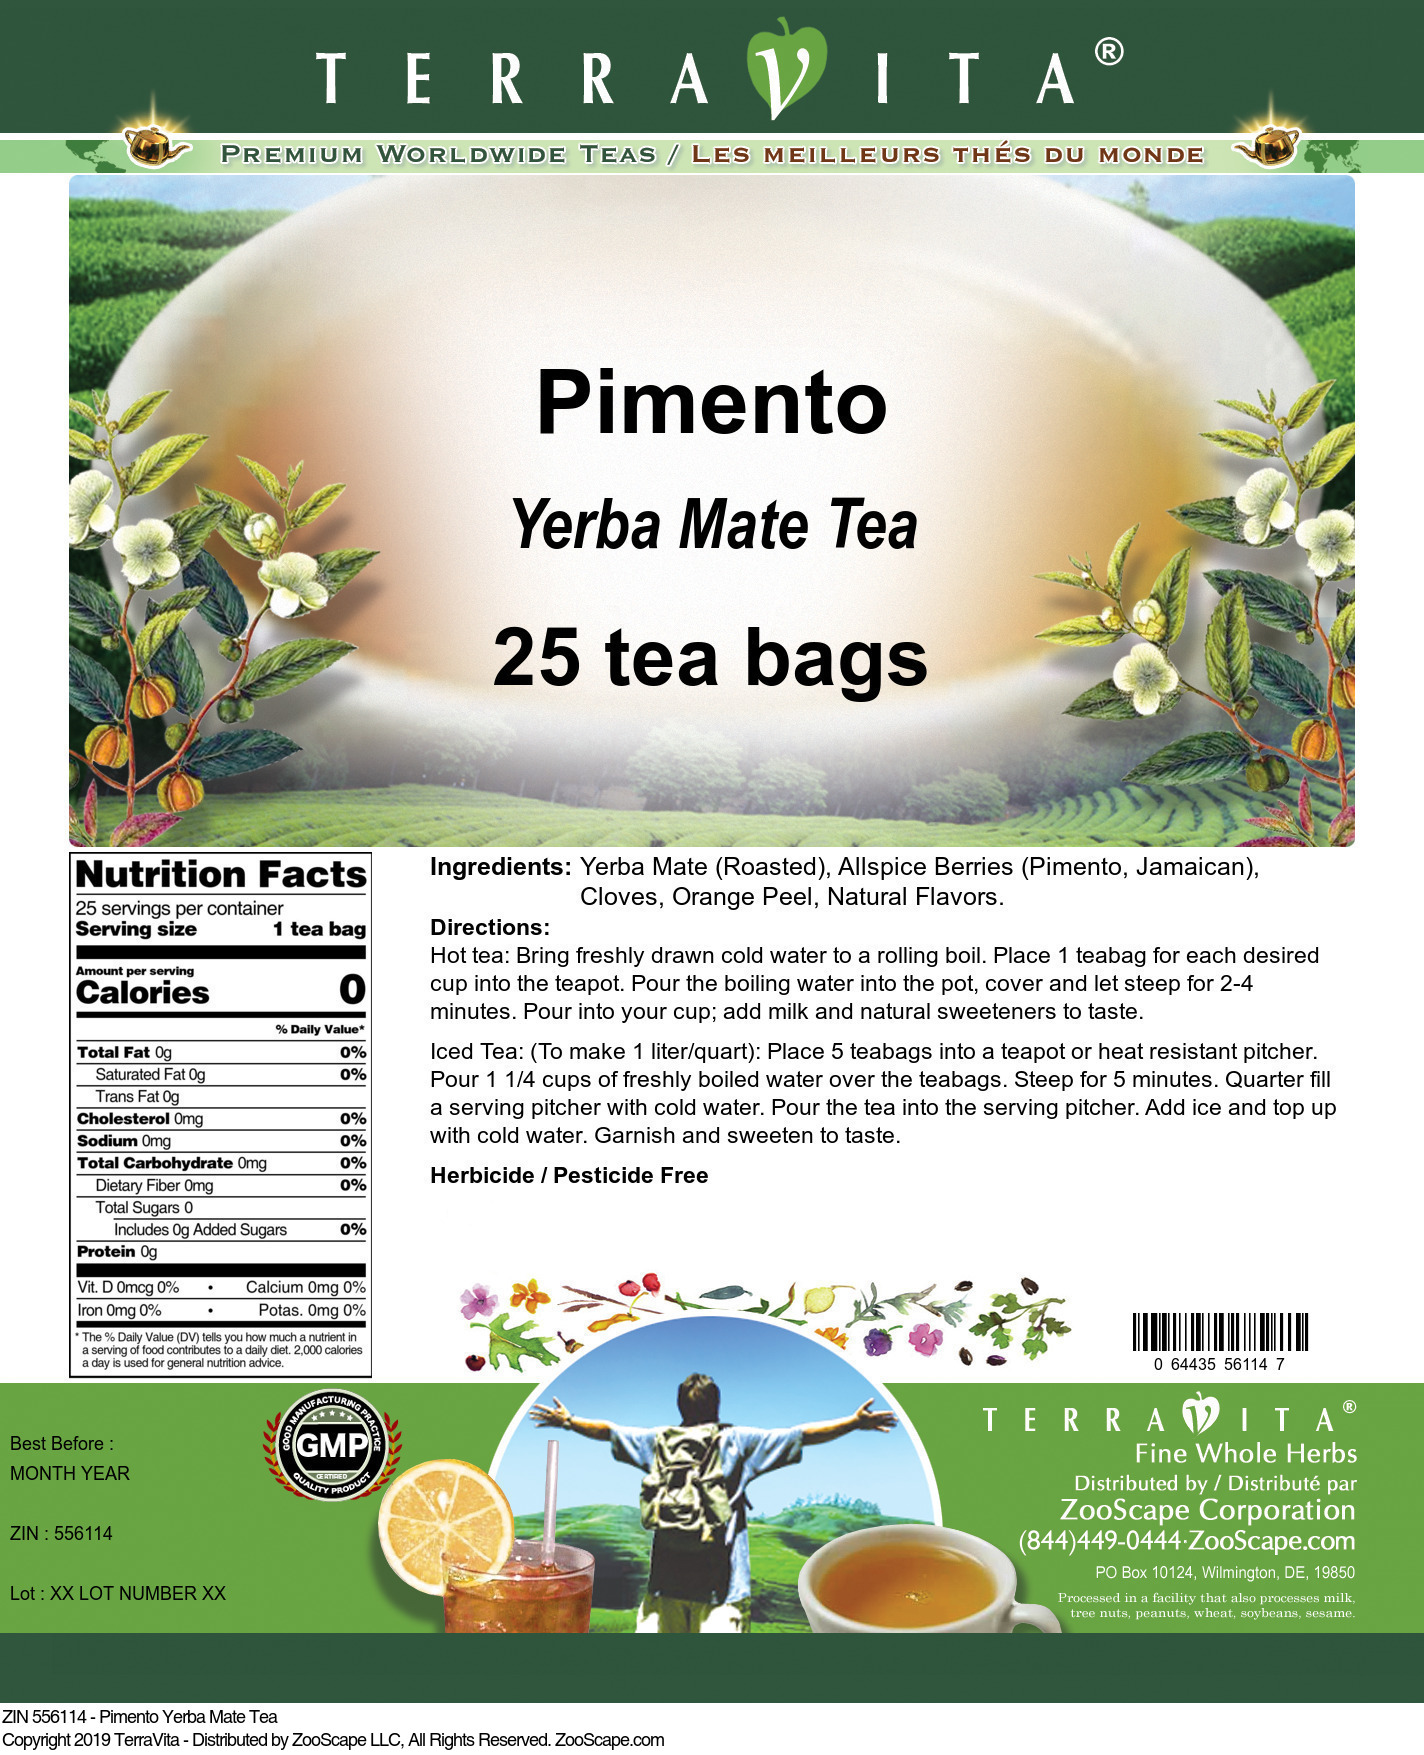 Pimento Yerba Mate Tea